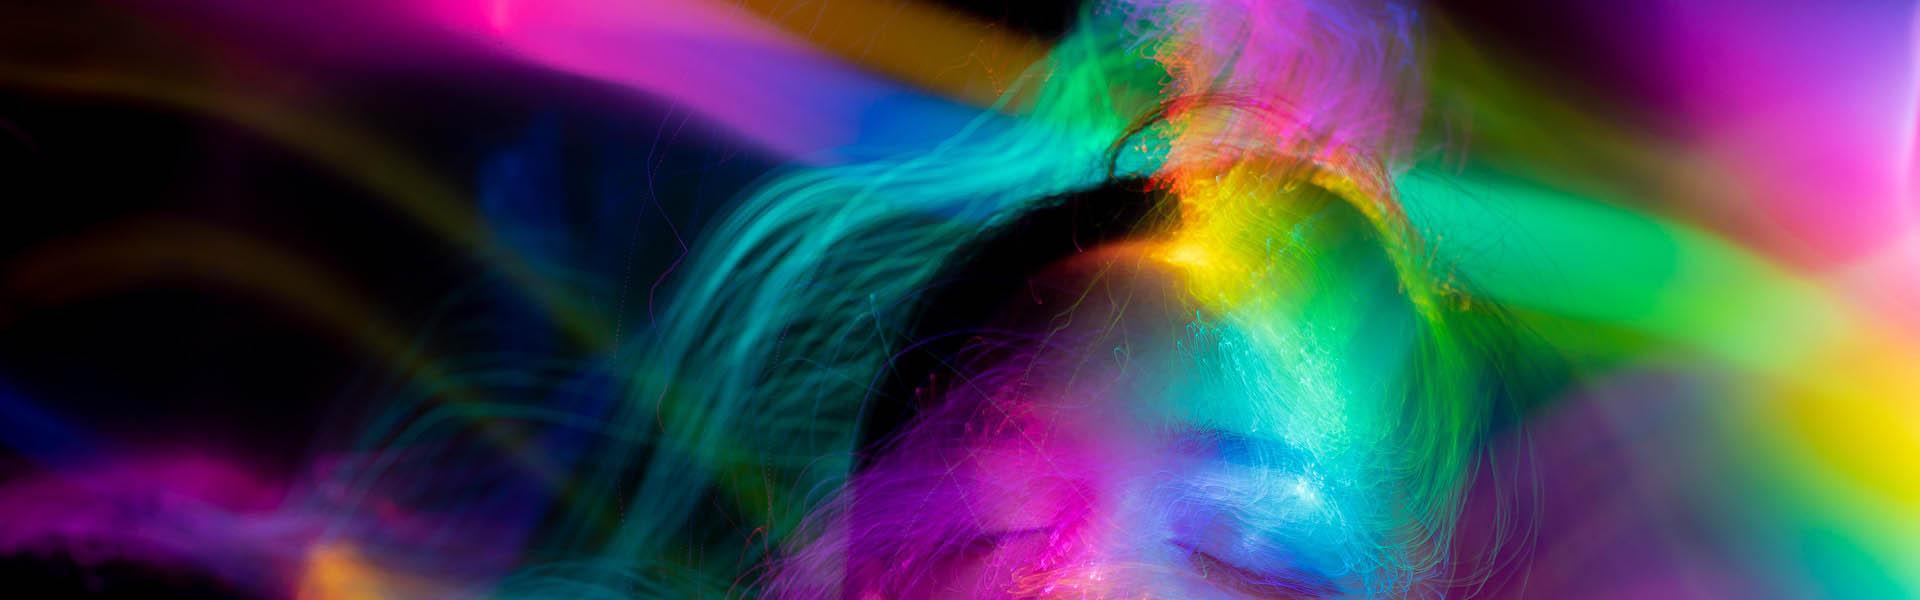 Diferència entre RGB i CMYK